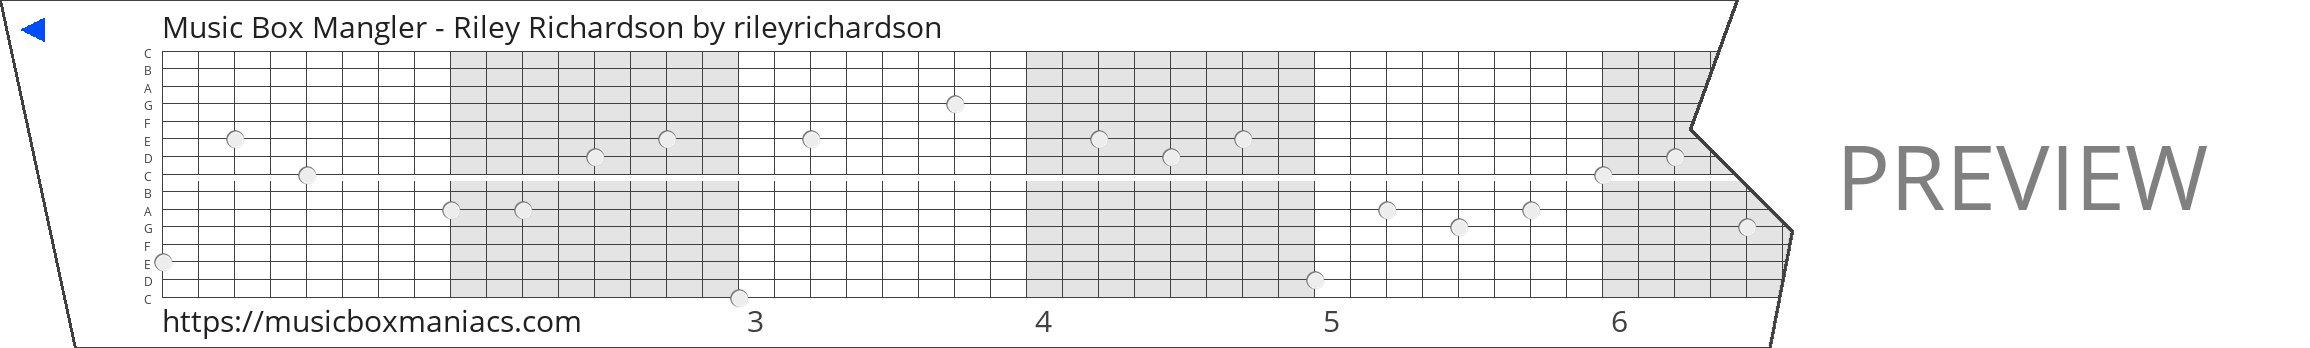 Music Box Mangler - Riley Richardson 15 note music box paper strip